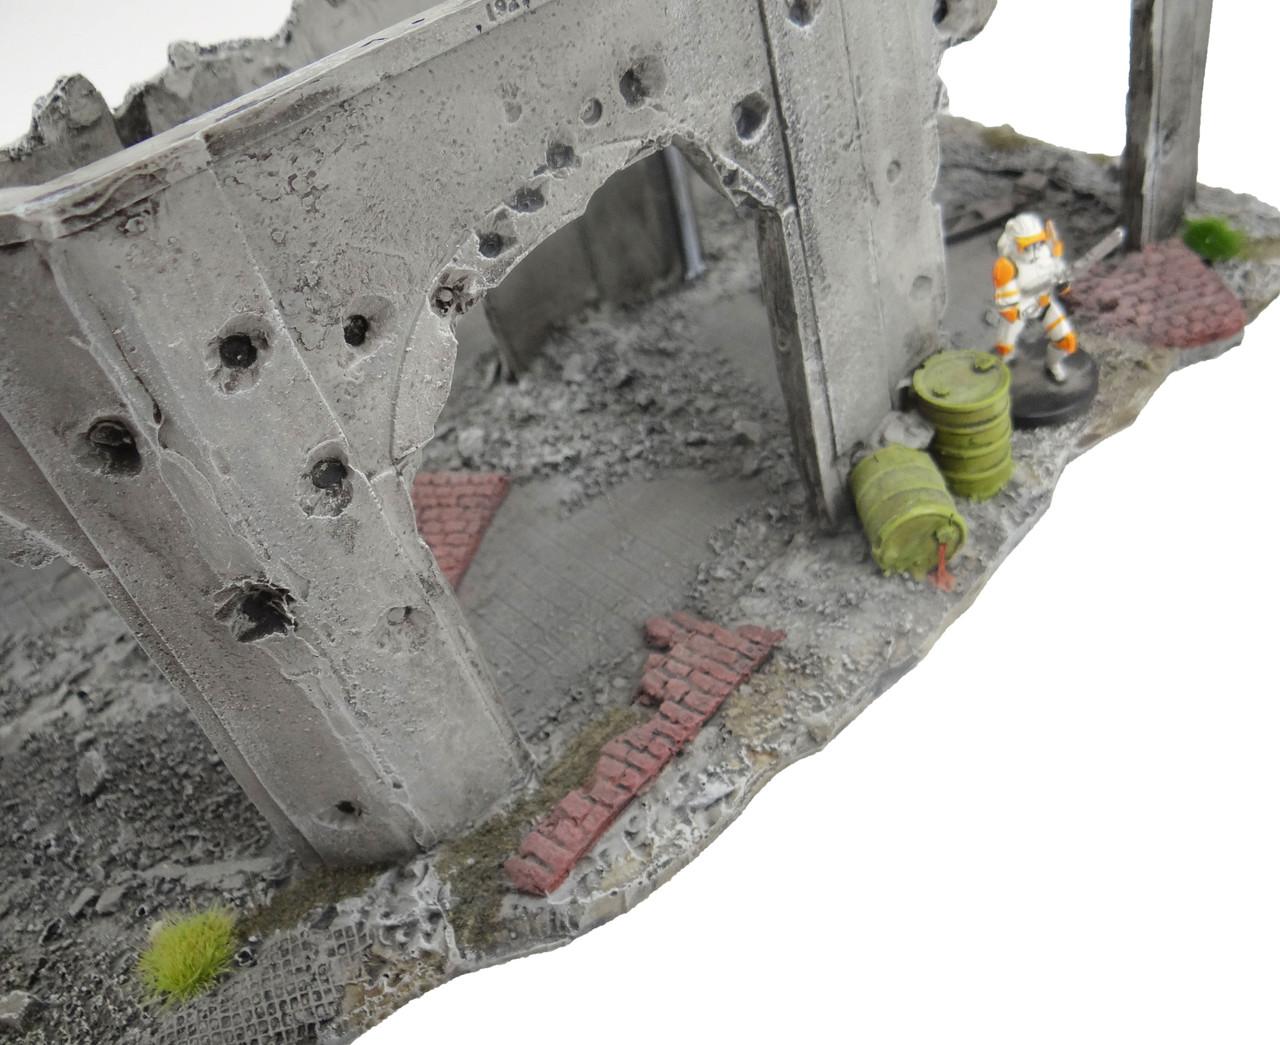 6mm Factory Ruins battle damage